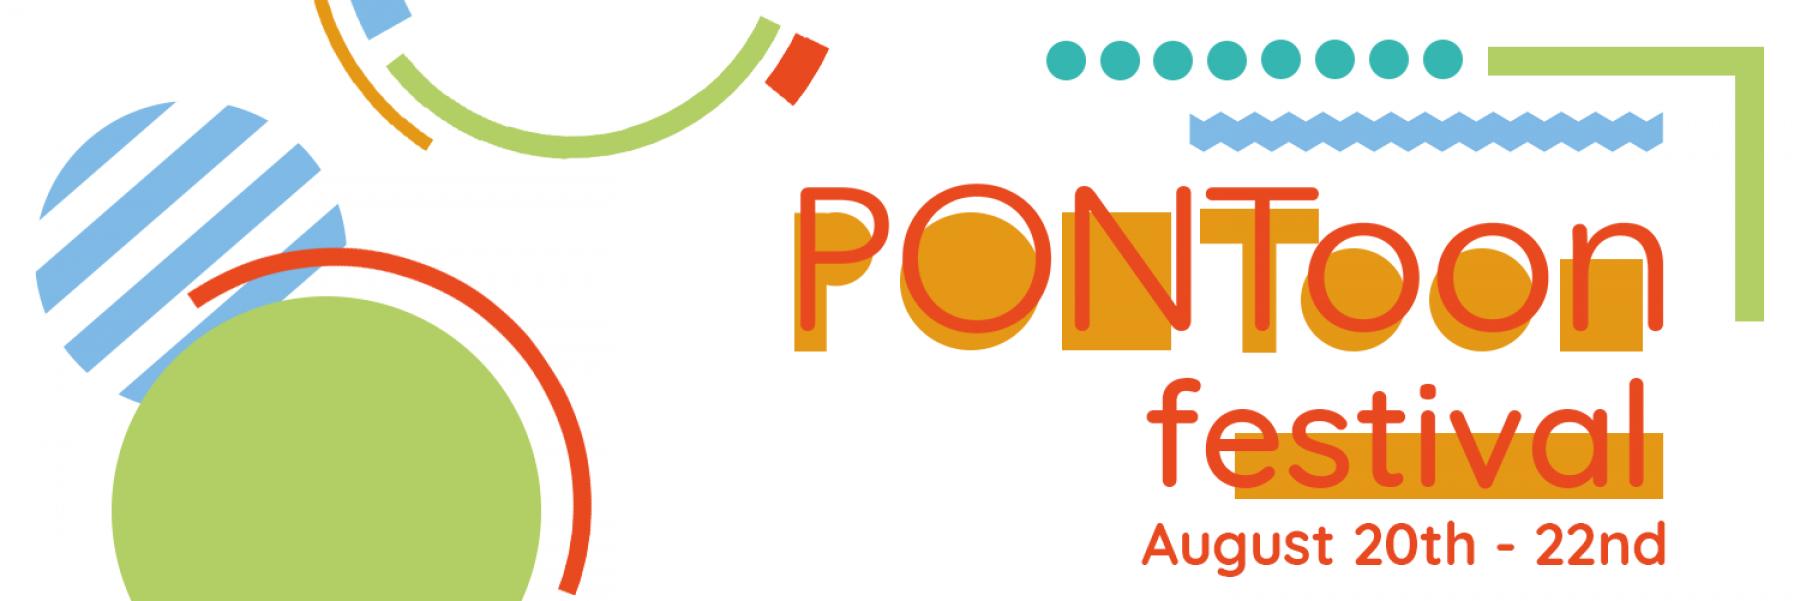 PONToon Festival Banner